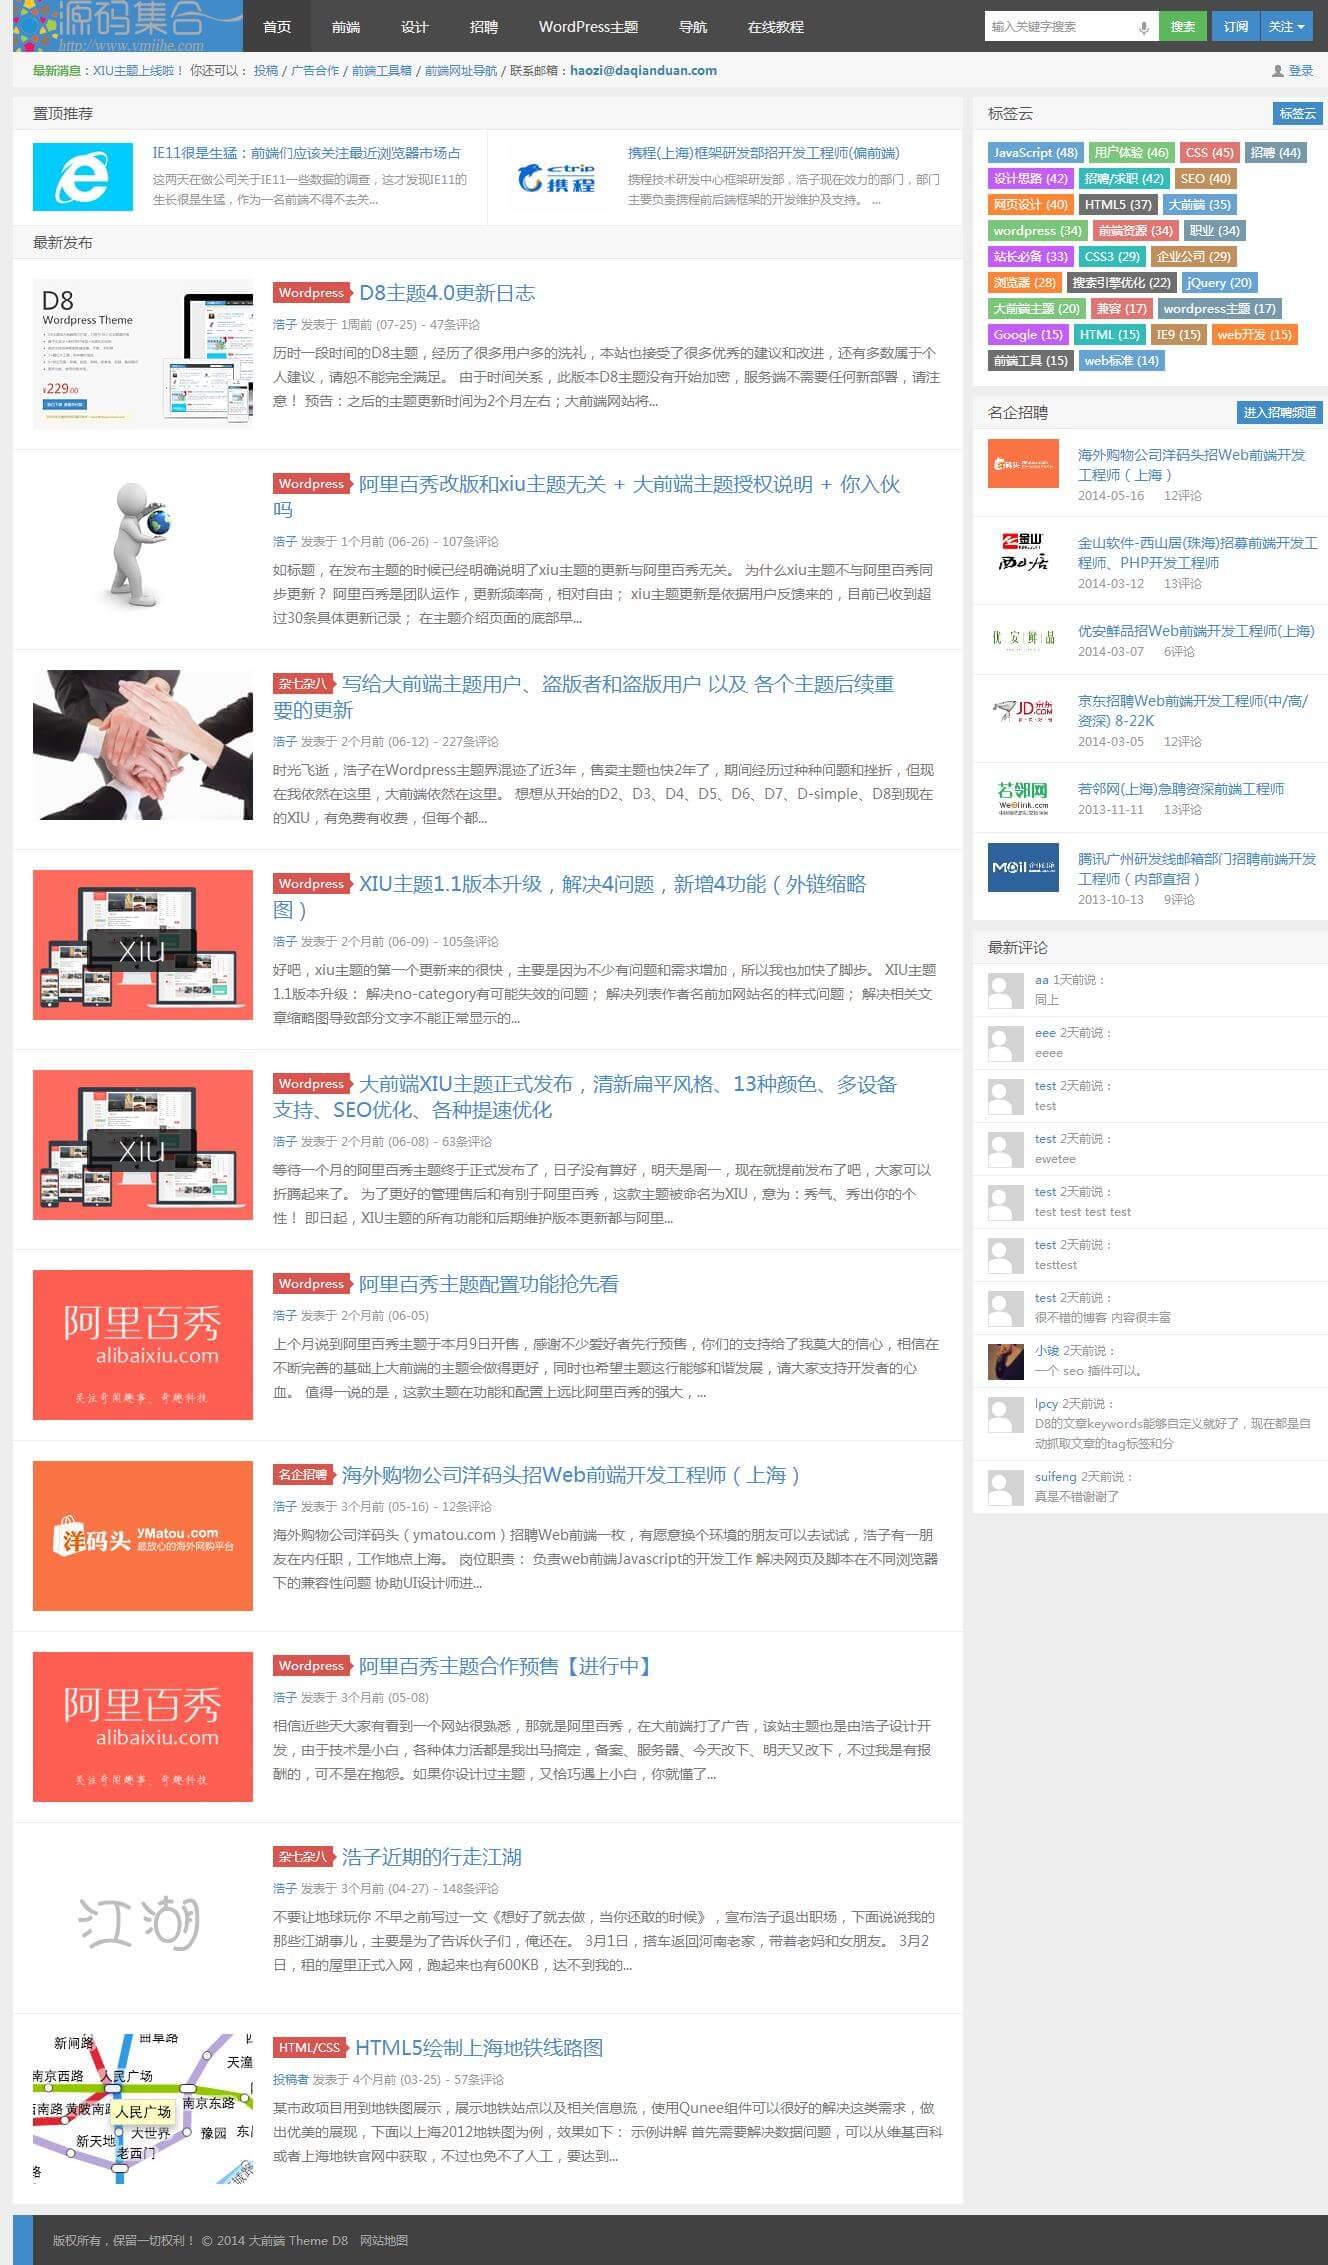 WordPress博客主题:大前端D8 4.0版本免费分享